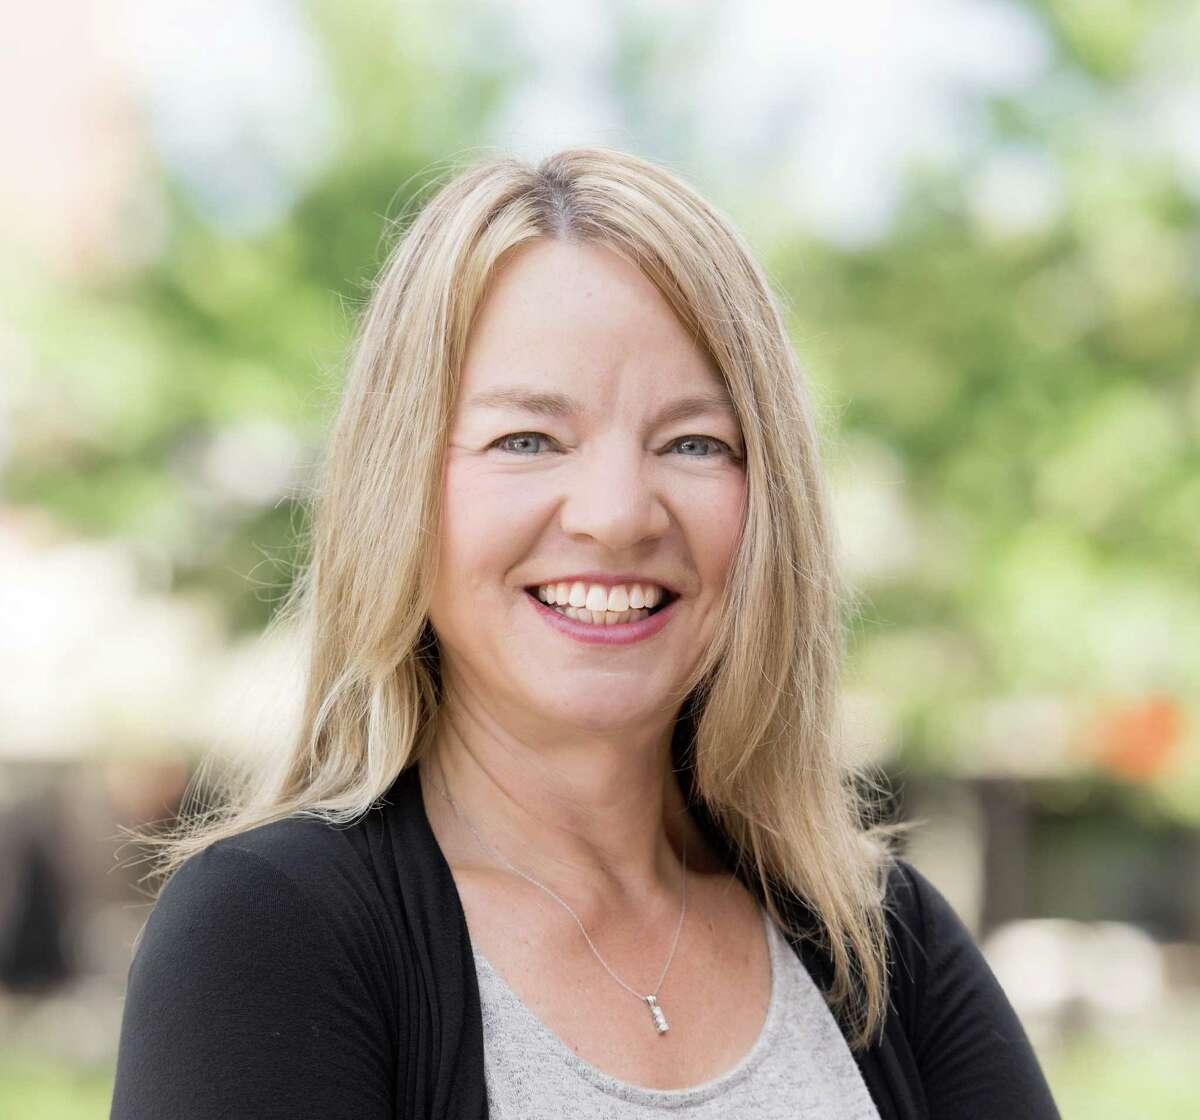 Dr. Carole Spangler Vaughn is CEO of Emtora Biosciences, a San Antonio-based drug development company.